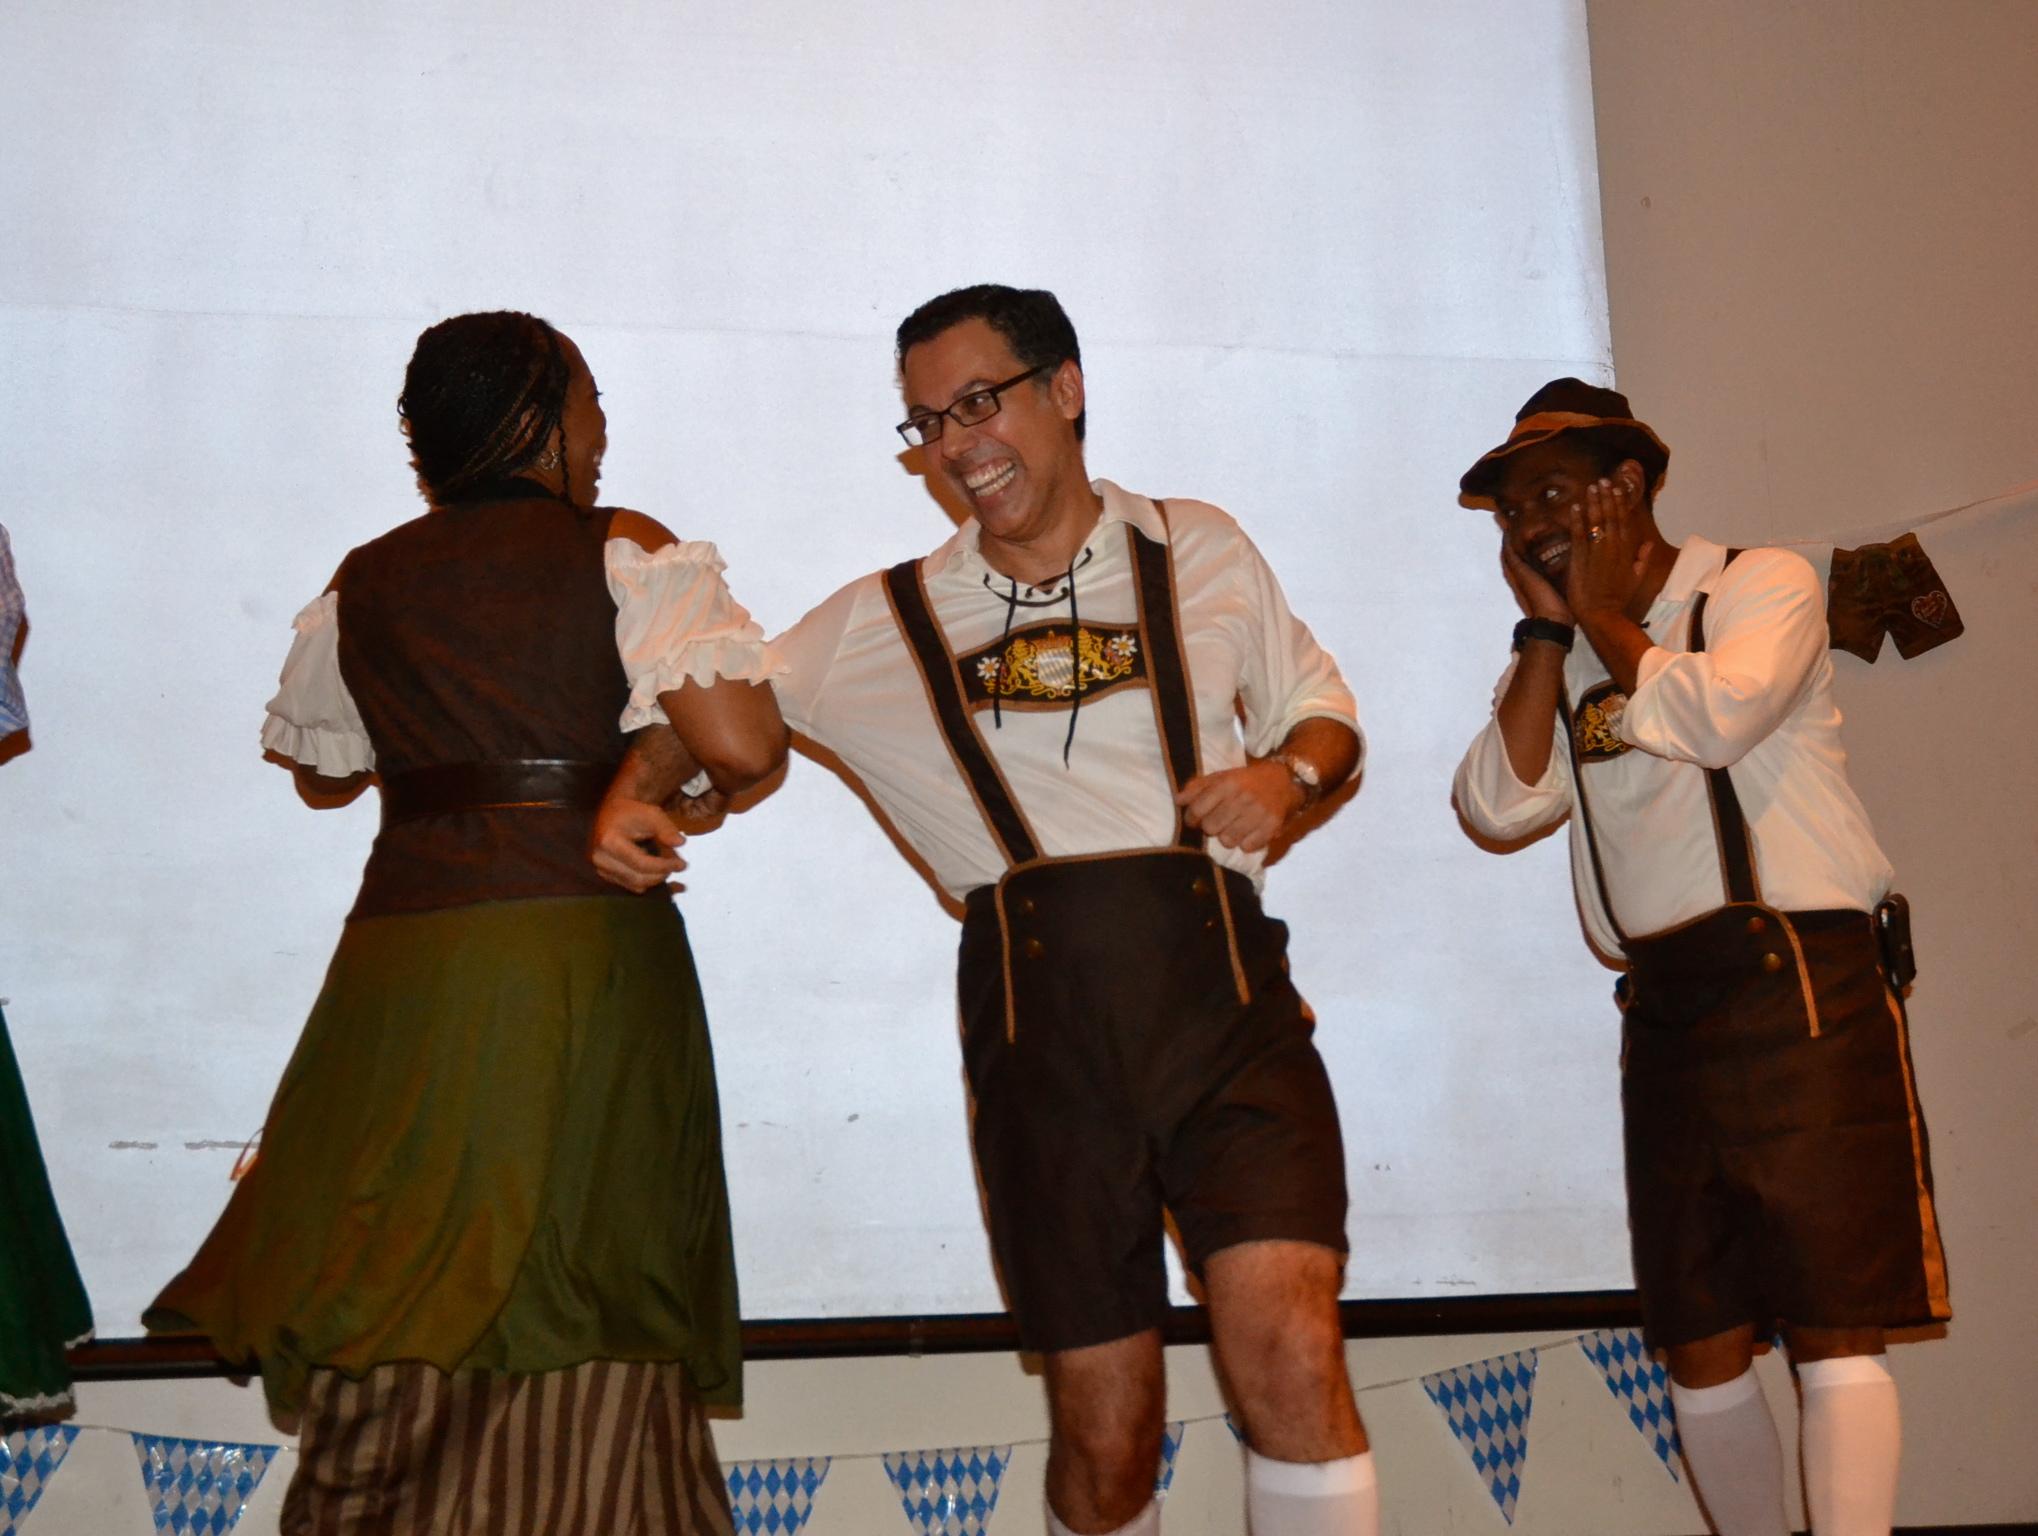 Oktoberfest dancing